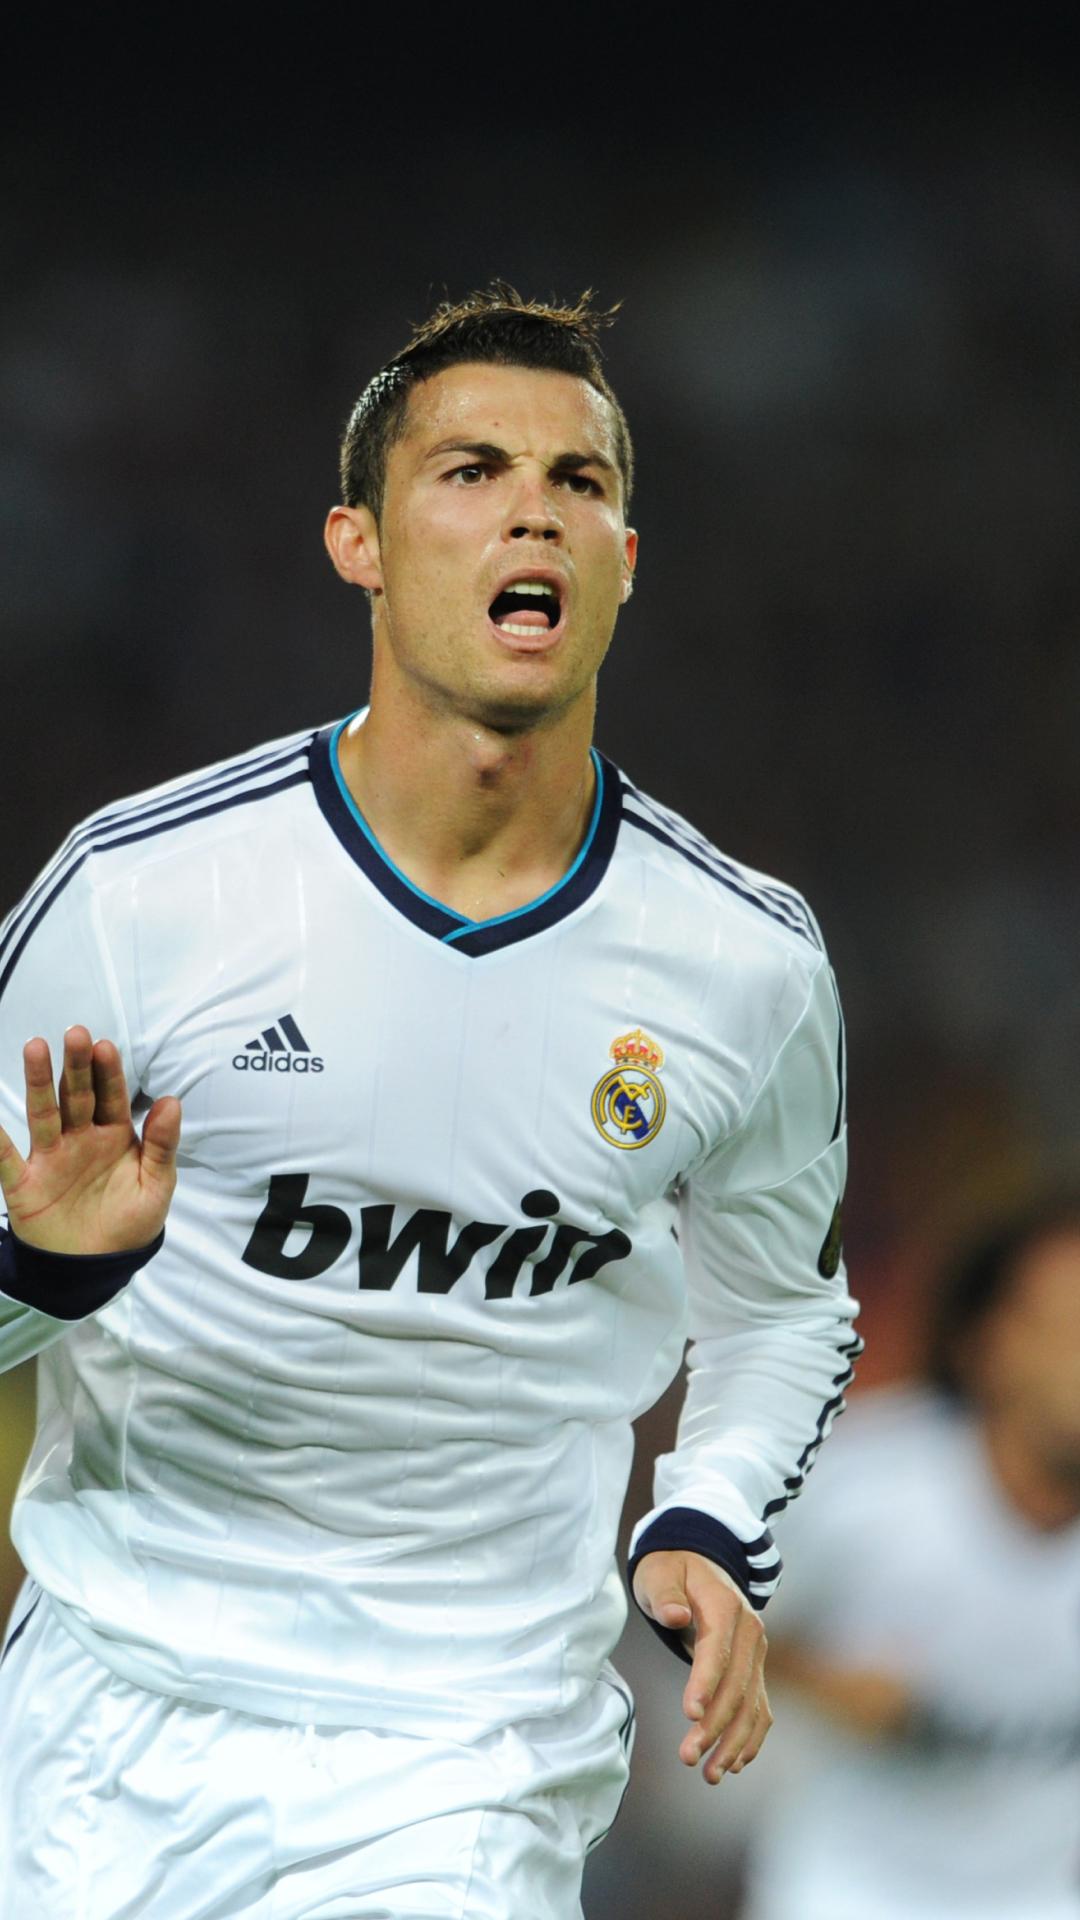 Cristiano Ronaldo Wallpaper For Iphone 6 Plus